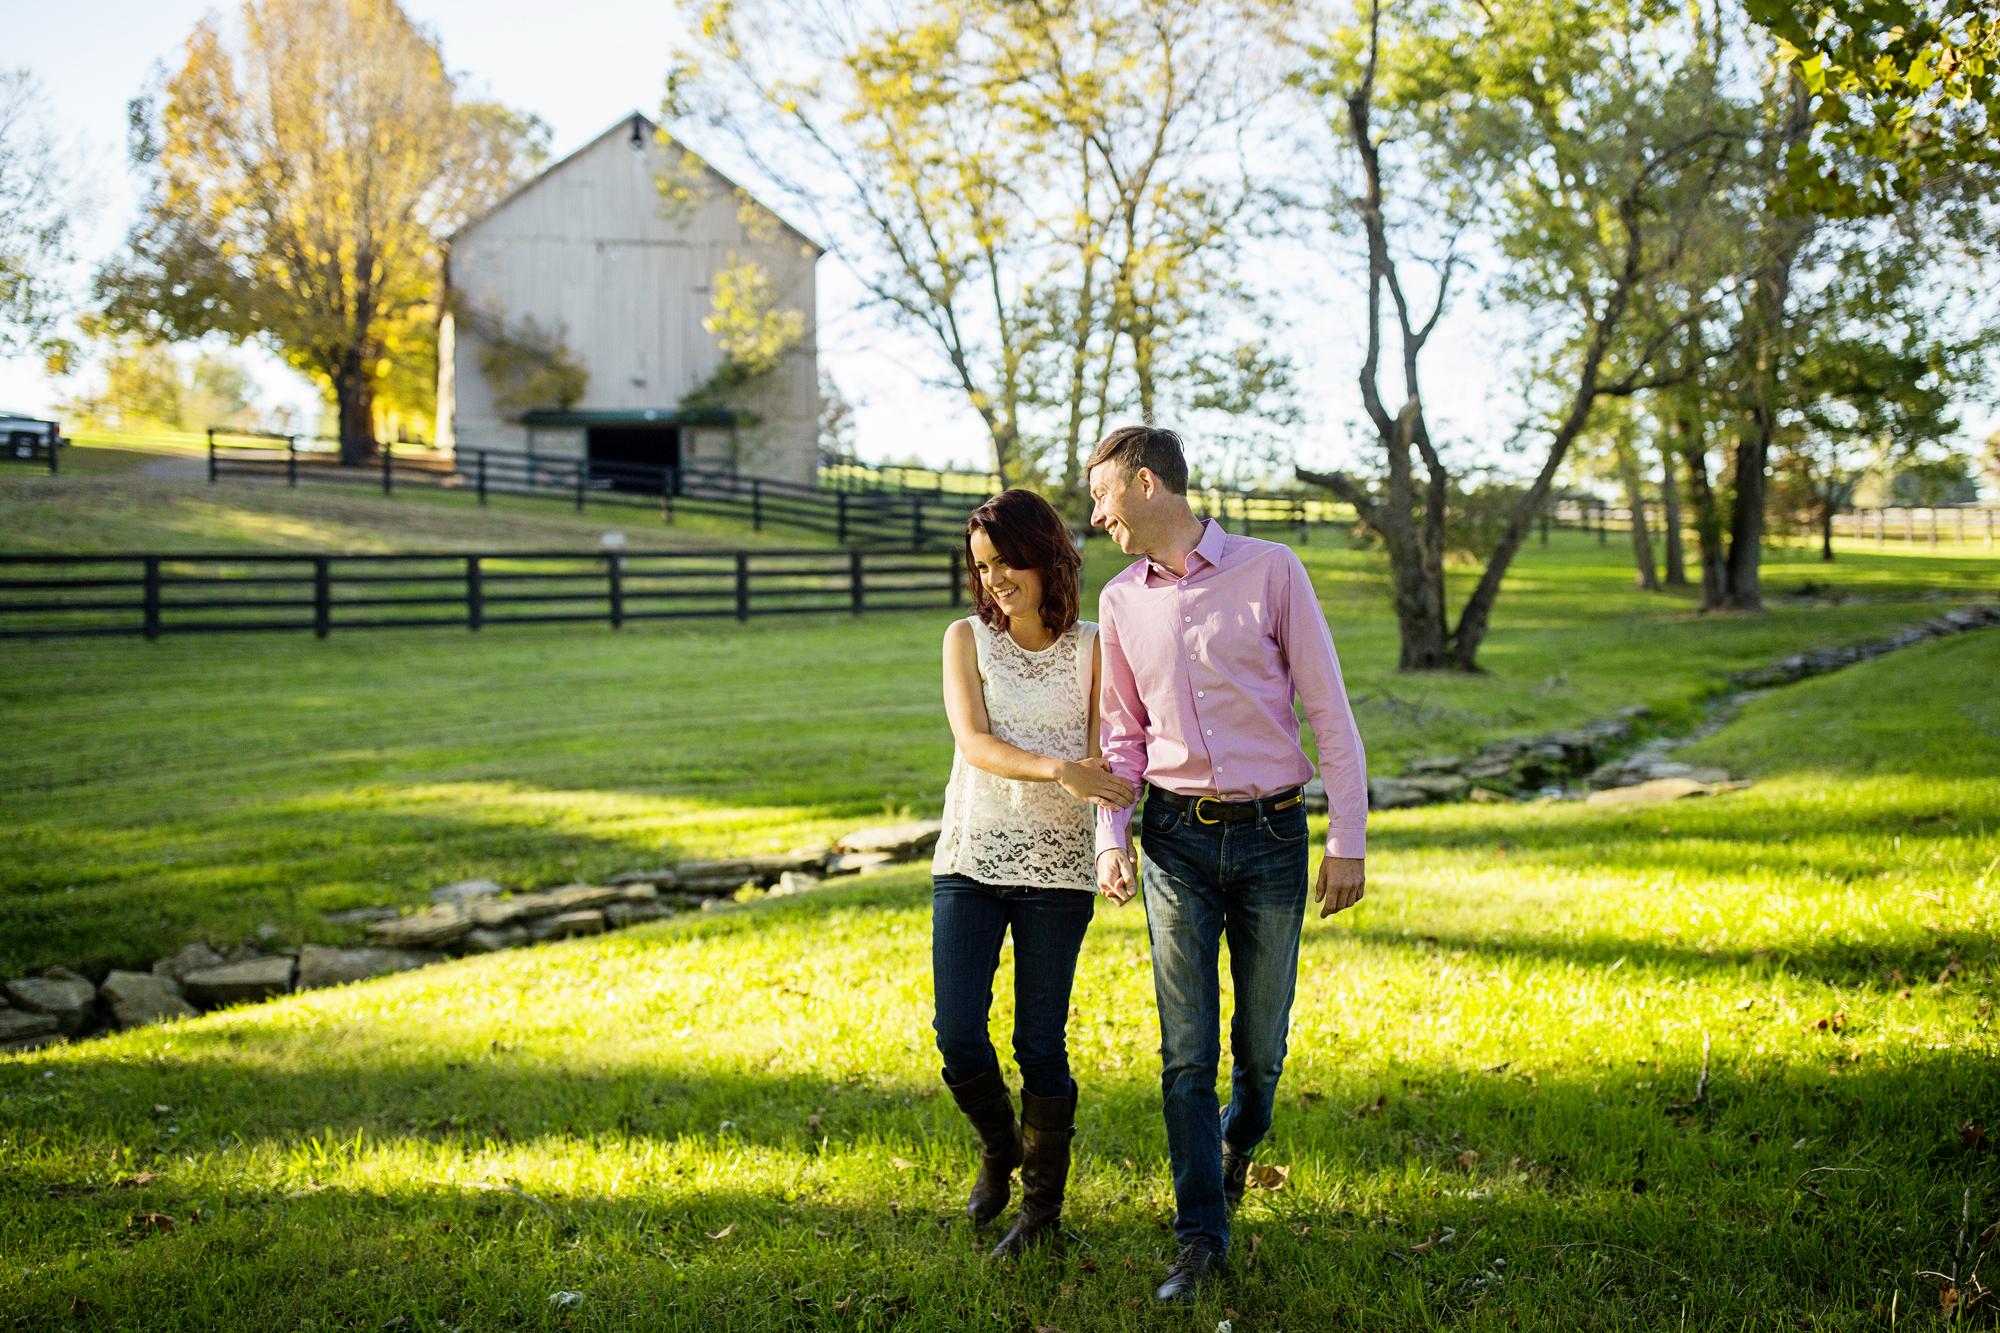 Seriously_Sabrina_Photography_Lexington_Kentucky_Burl_Winstar_Farm_Engagement_AliJerry_4.jpg